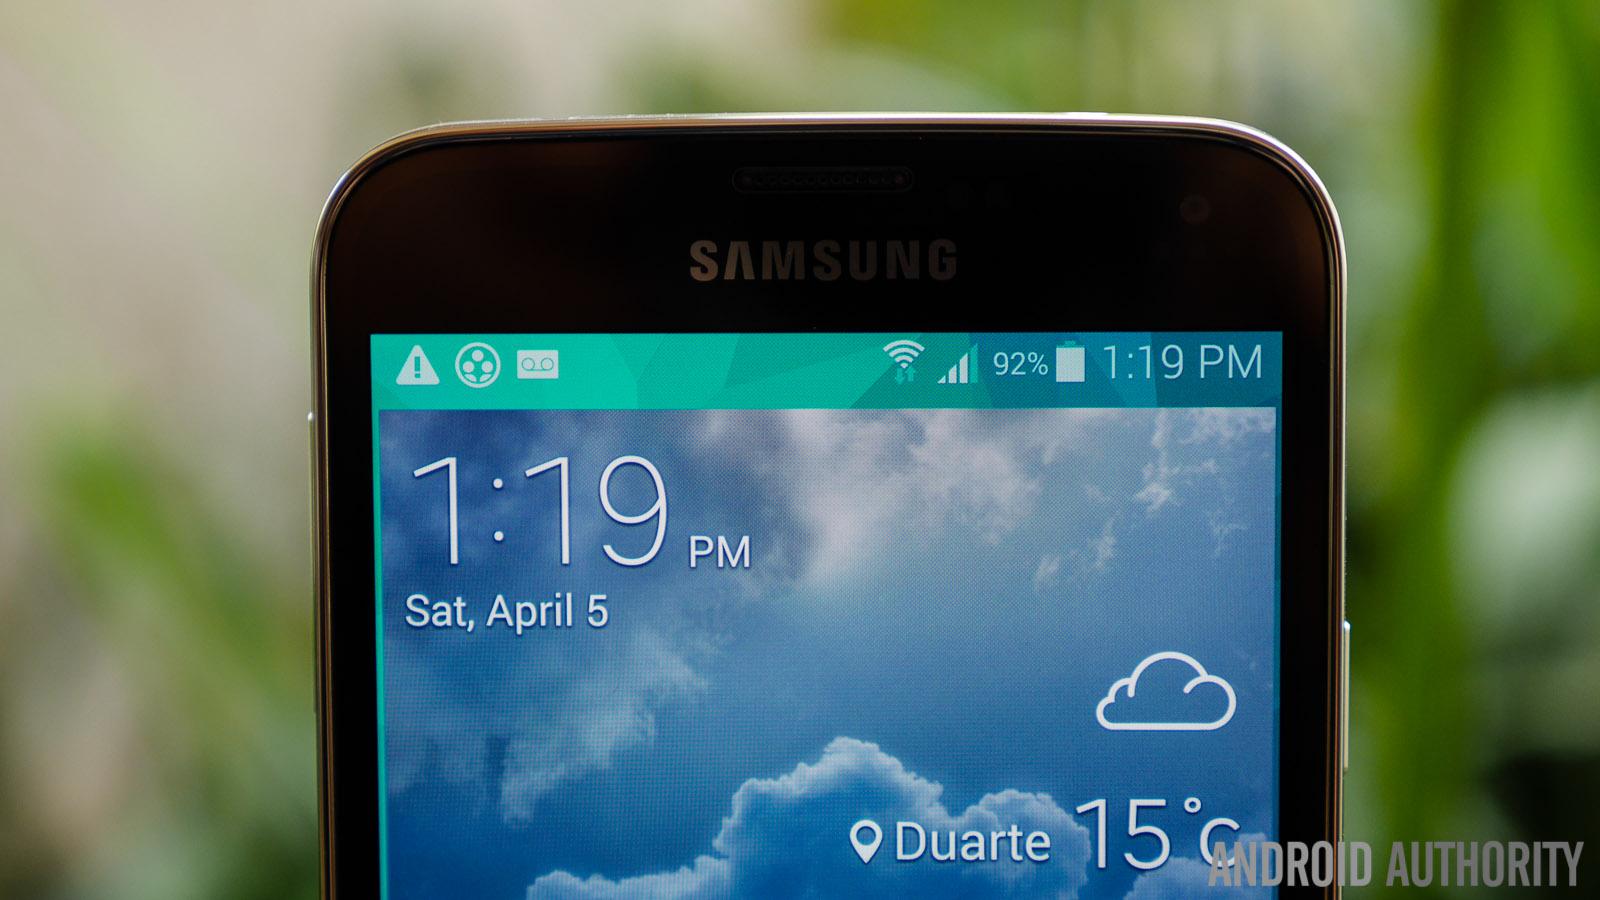 Samsung Galaxy S5 teardown reveals a bill of materials worth $256